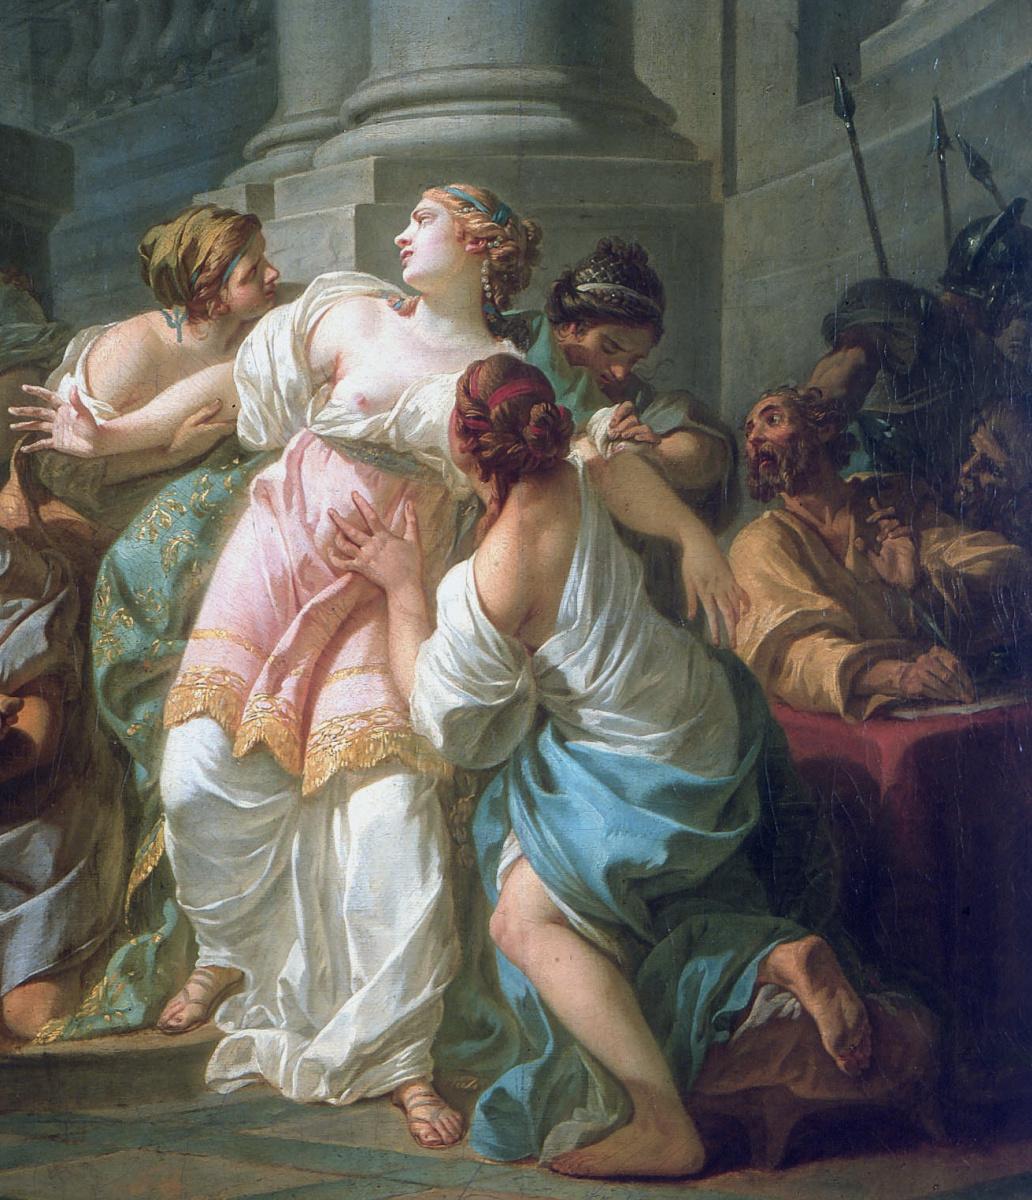 Jacques-Louis David. The Death Of Seneca. Fragment